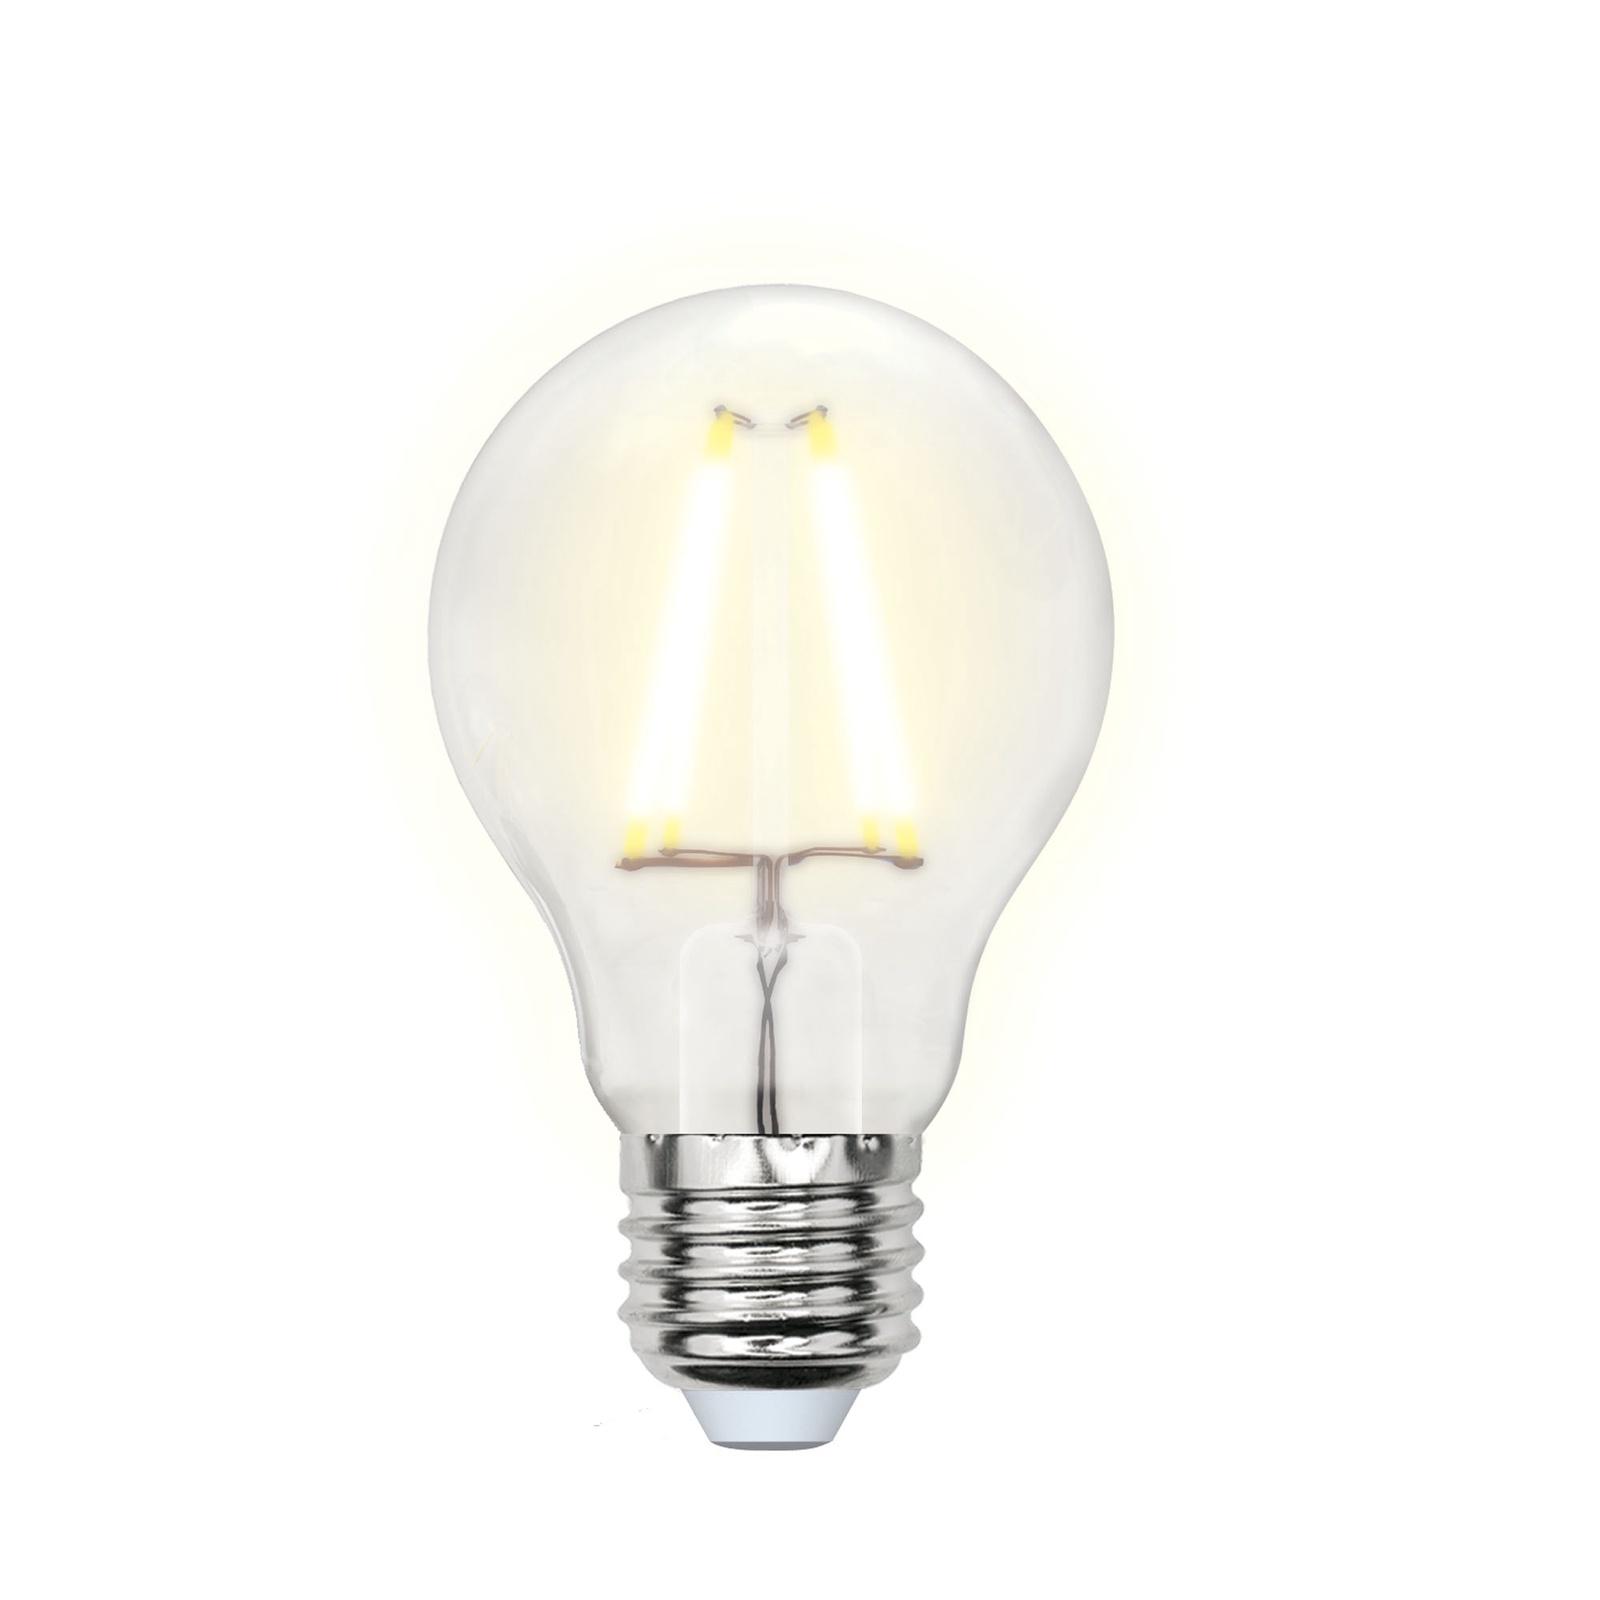 Лампочка Uniel LED-A60-8W/WW/E27/FR 3000K, Теплый свет 8 Вт, Светодиодная